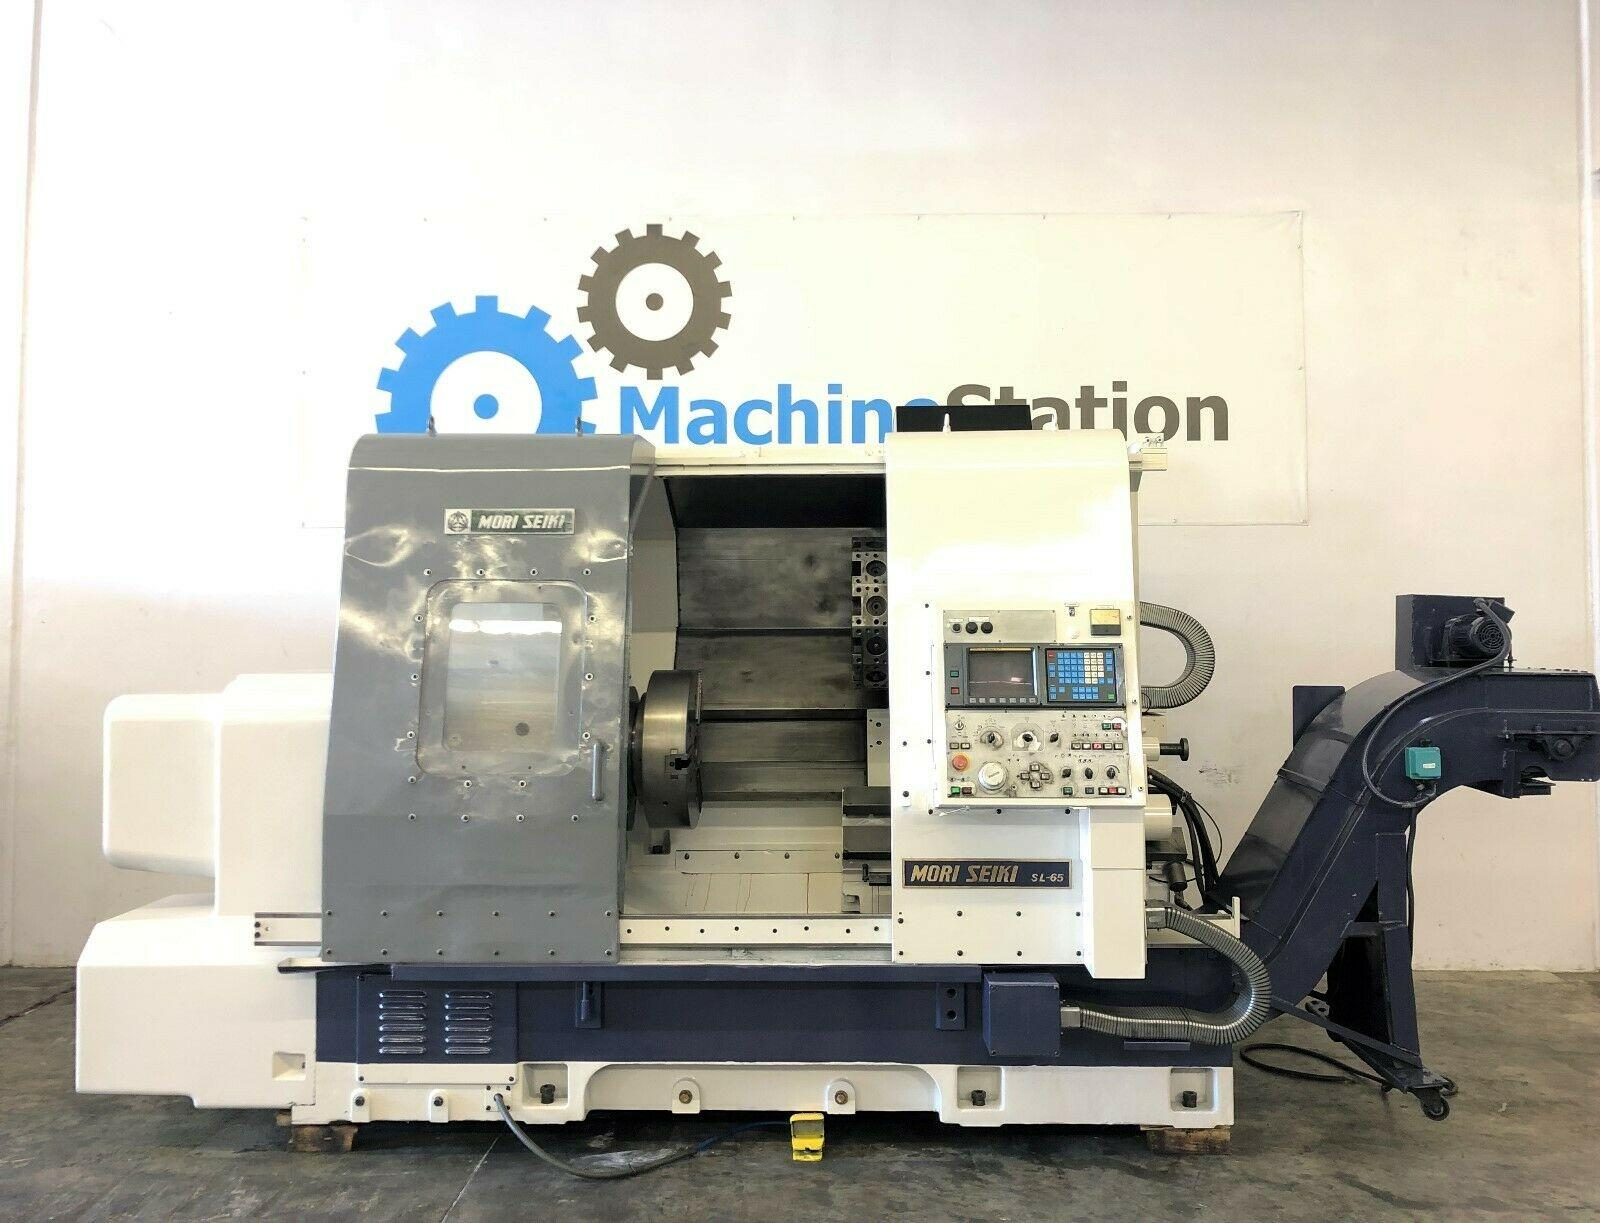 MORI SEIKI - Used Machines | Machine Hub